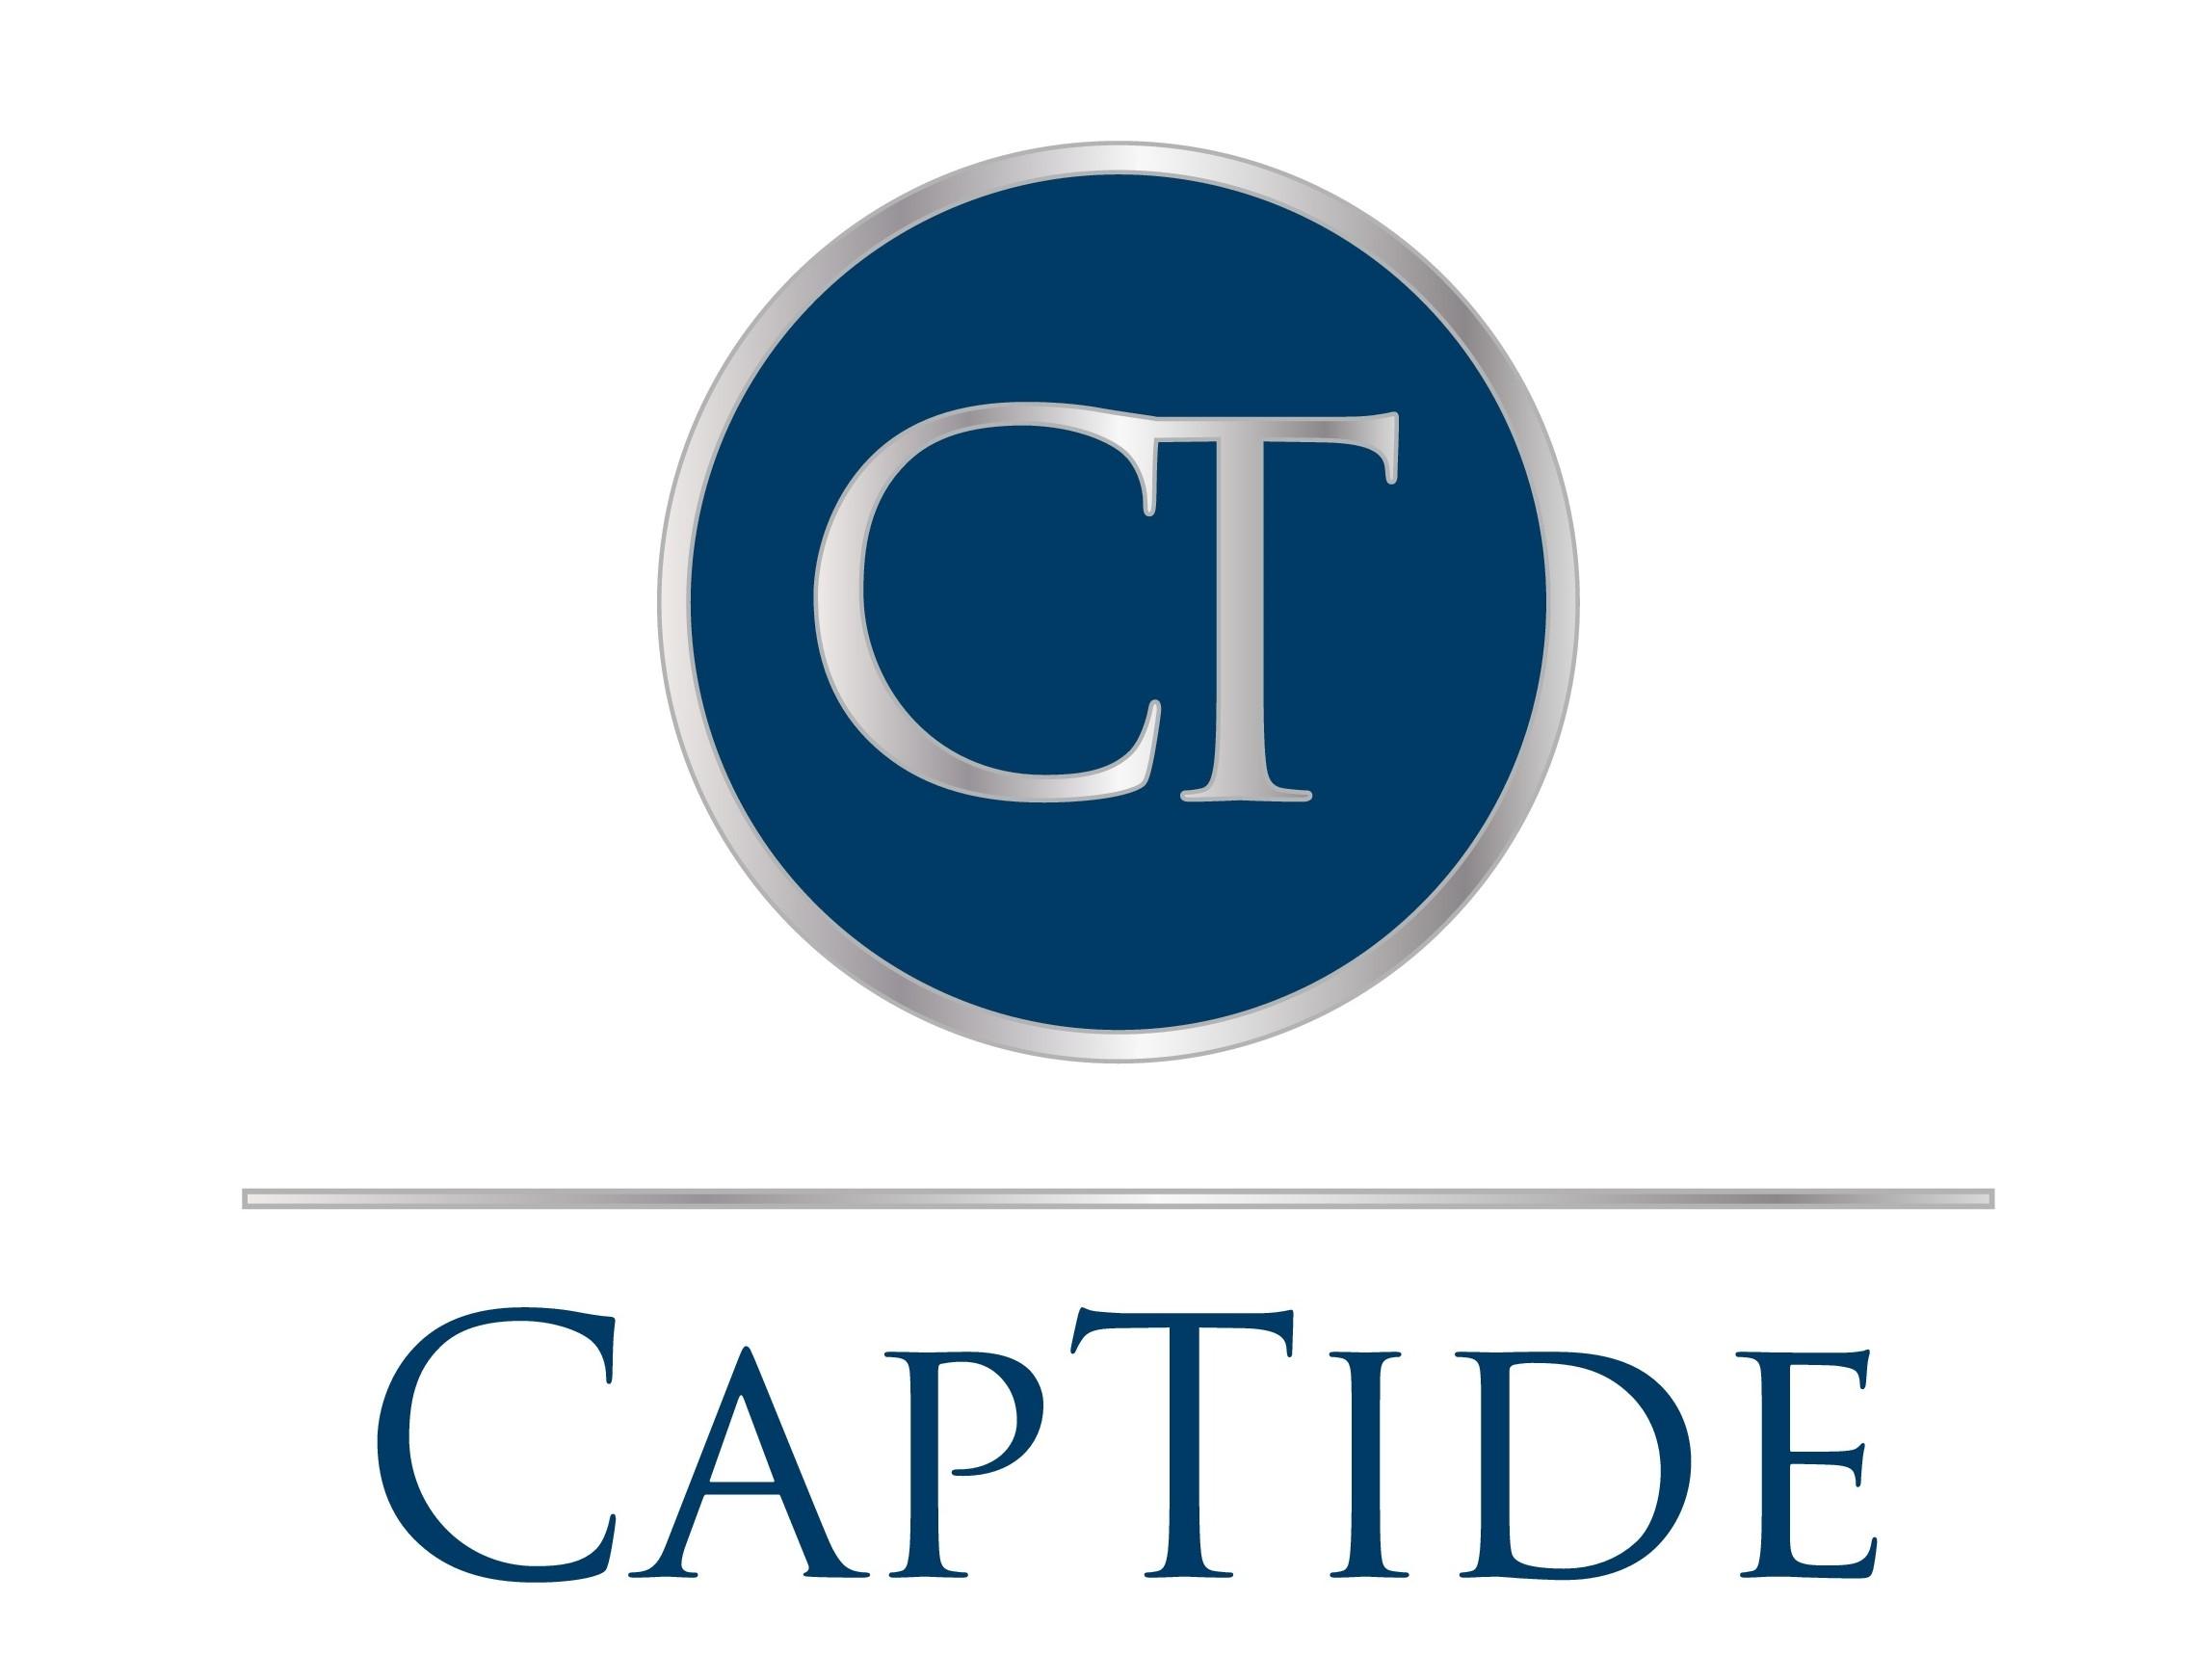 CapTide Vertriebs GmbH